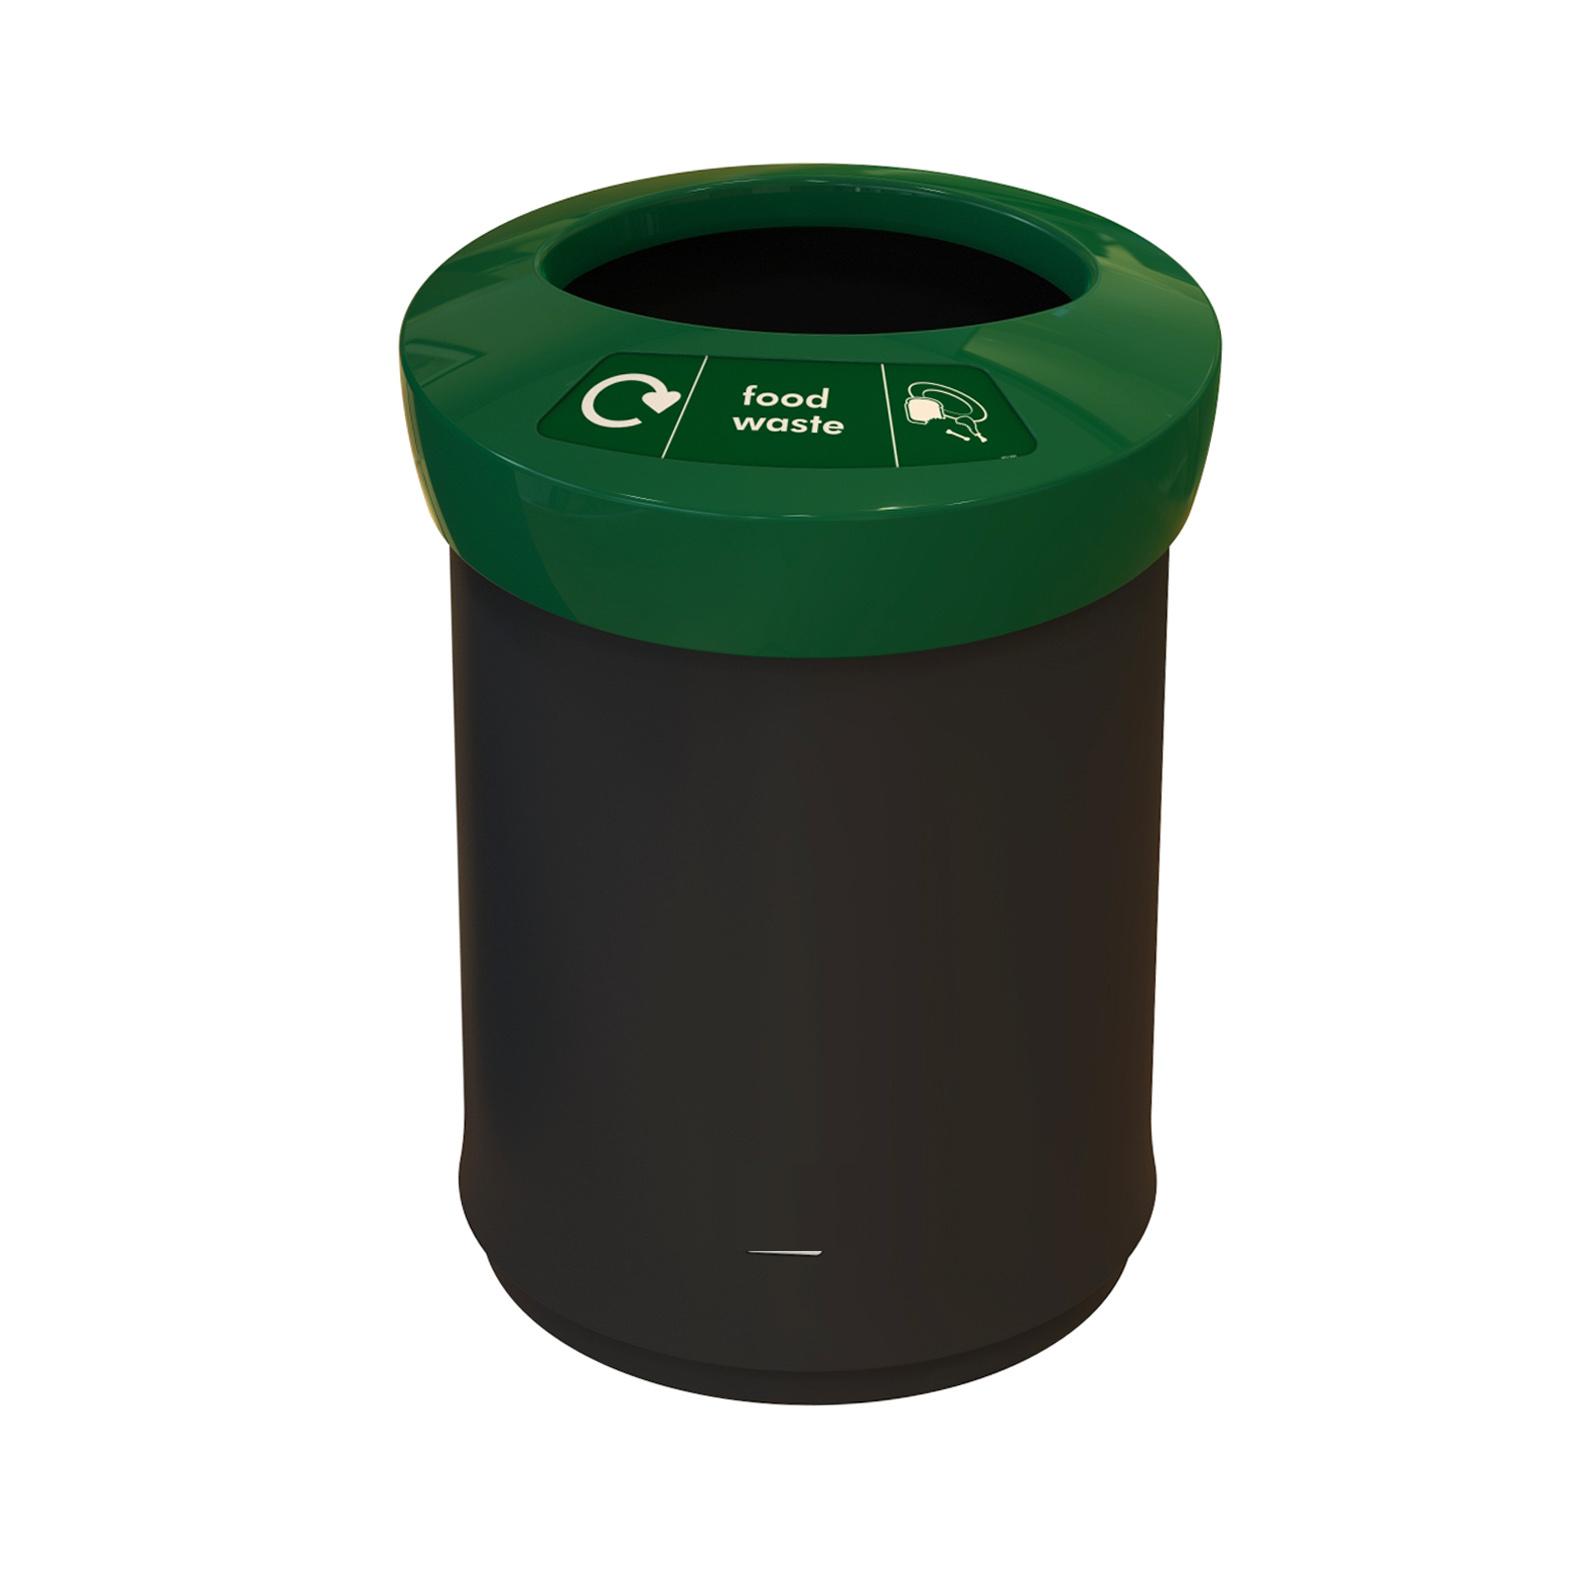 EcoAce-81900-52L-food-waste